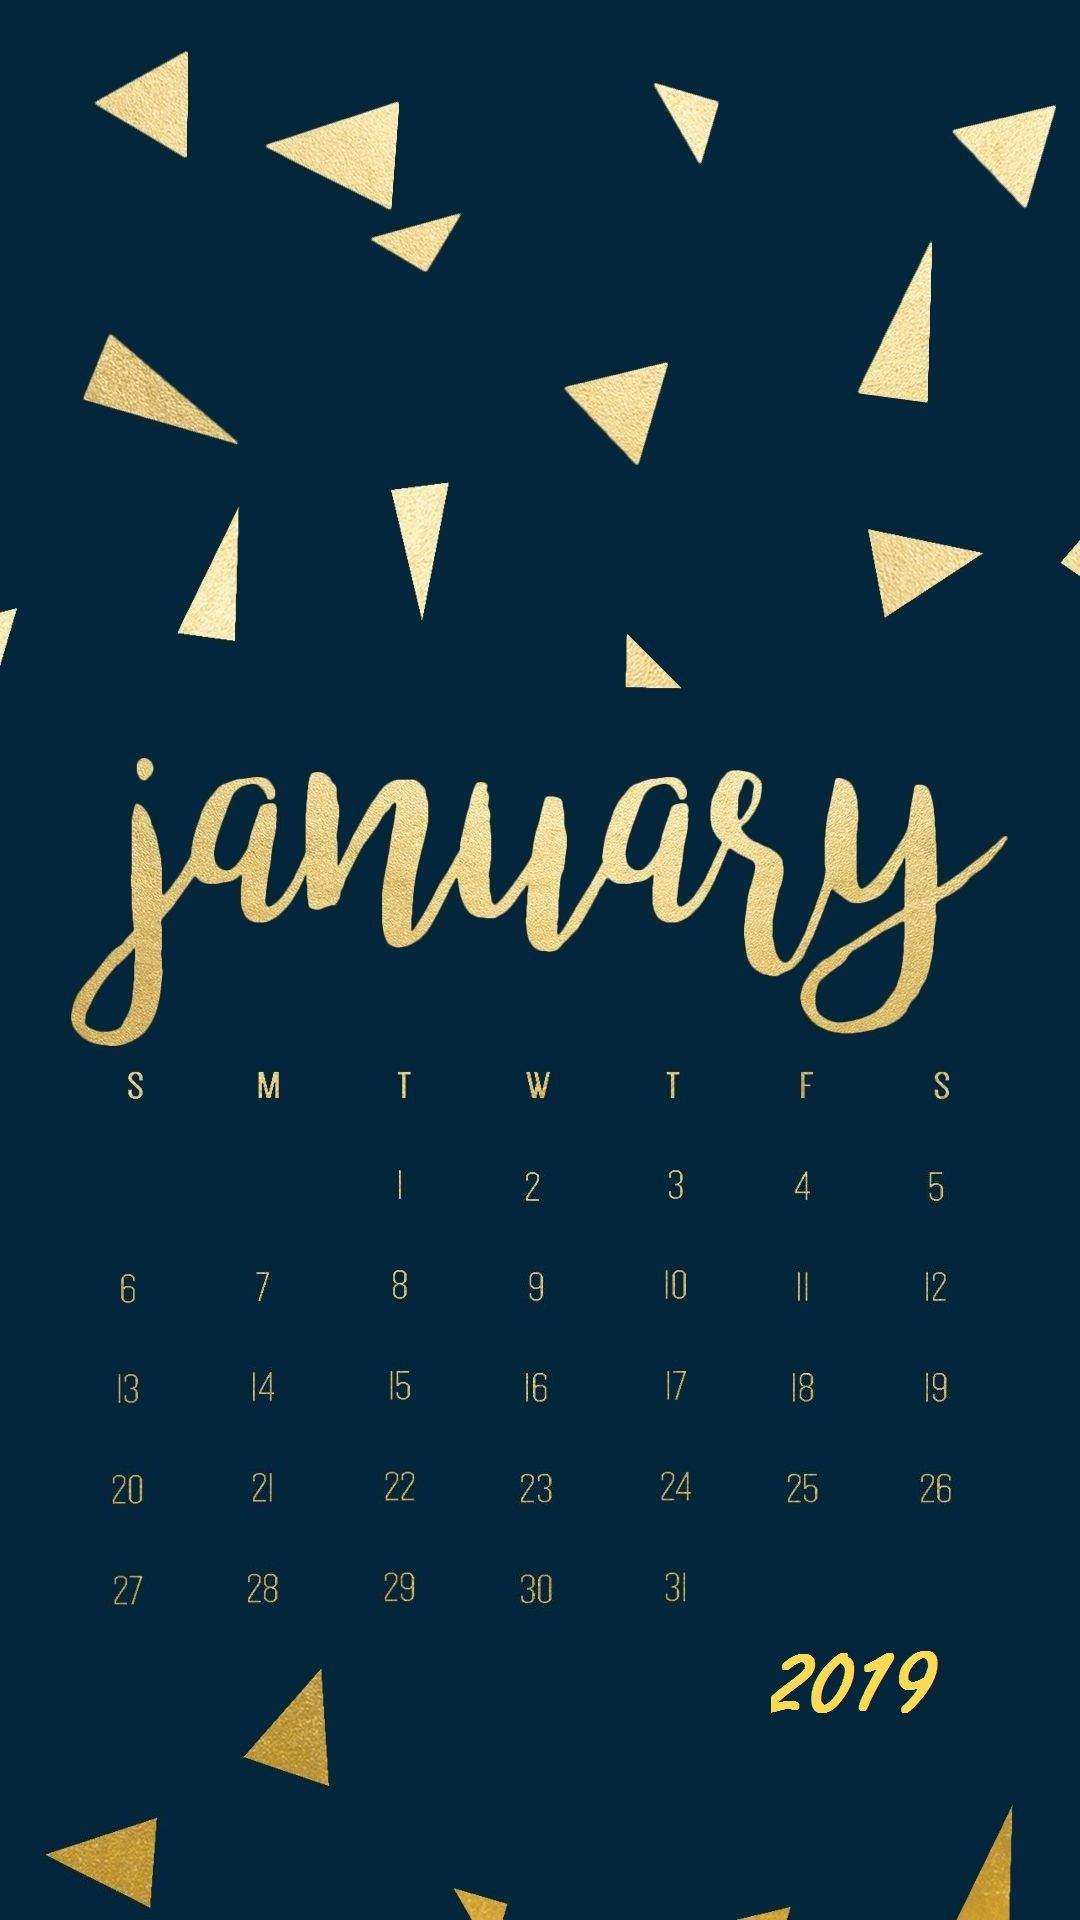 Golden Stones January 2019 Iphone Calendar Calendar